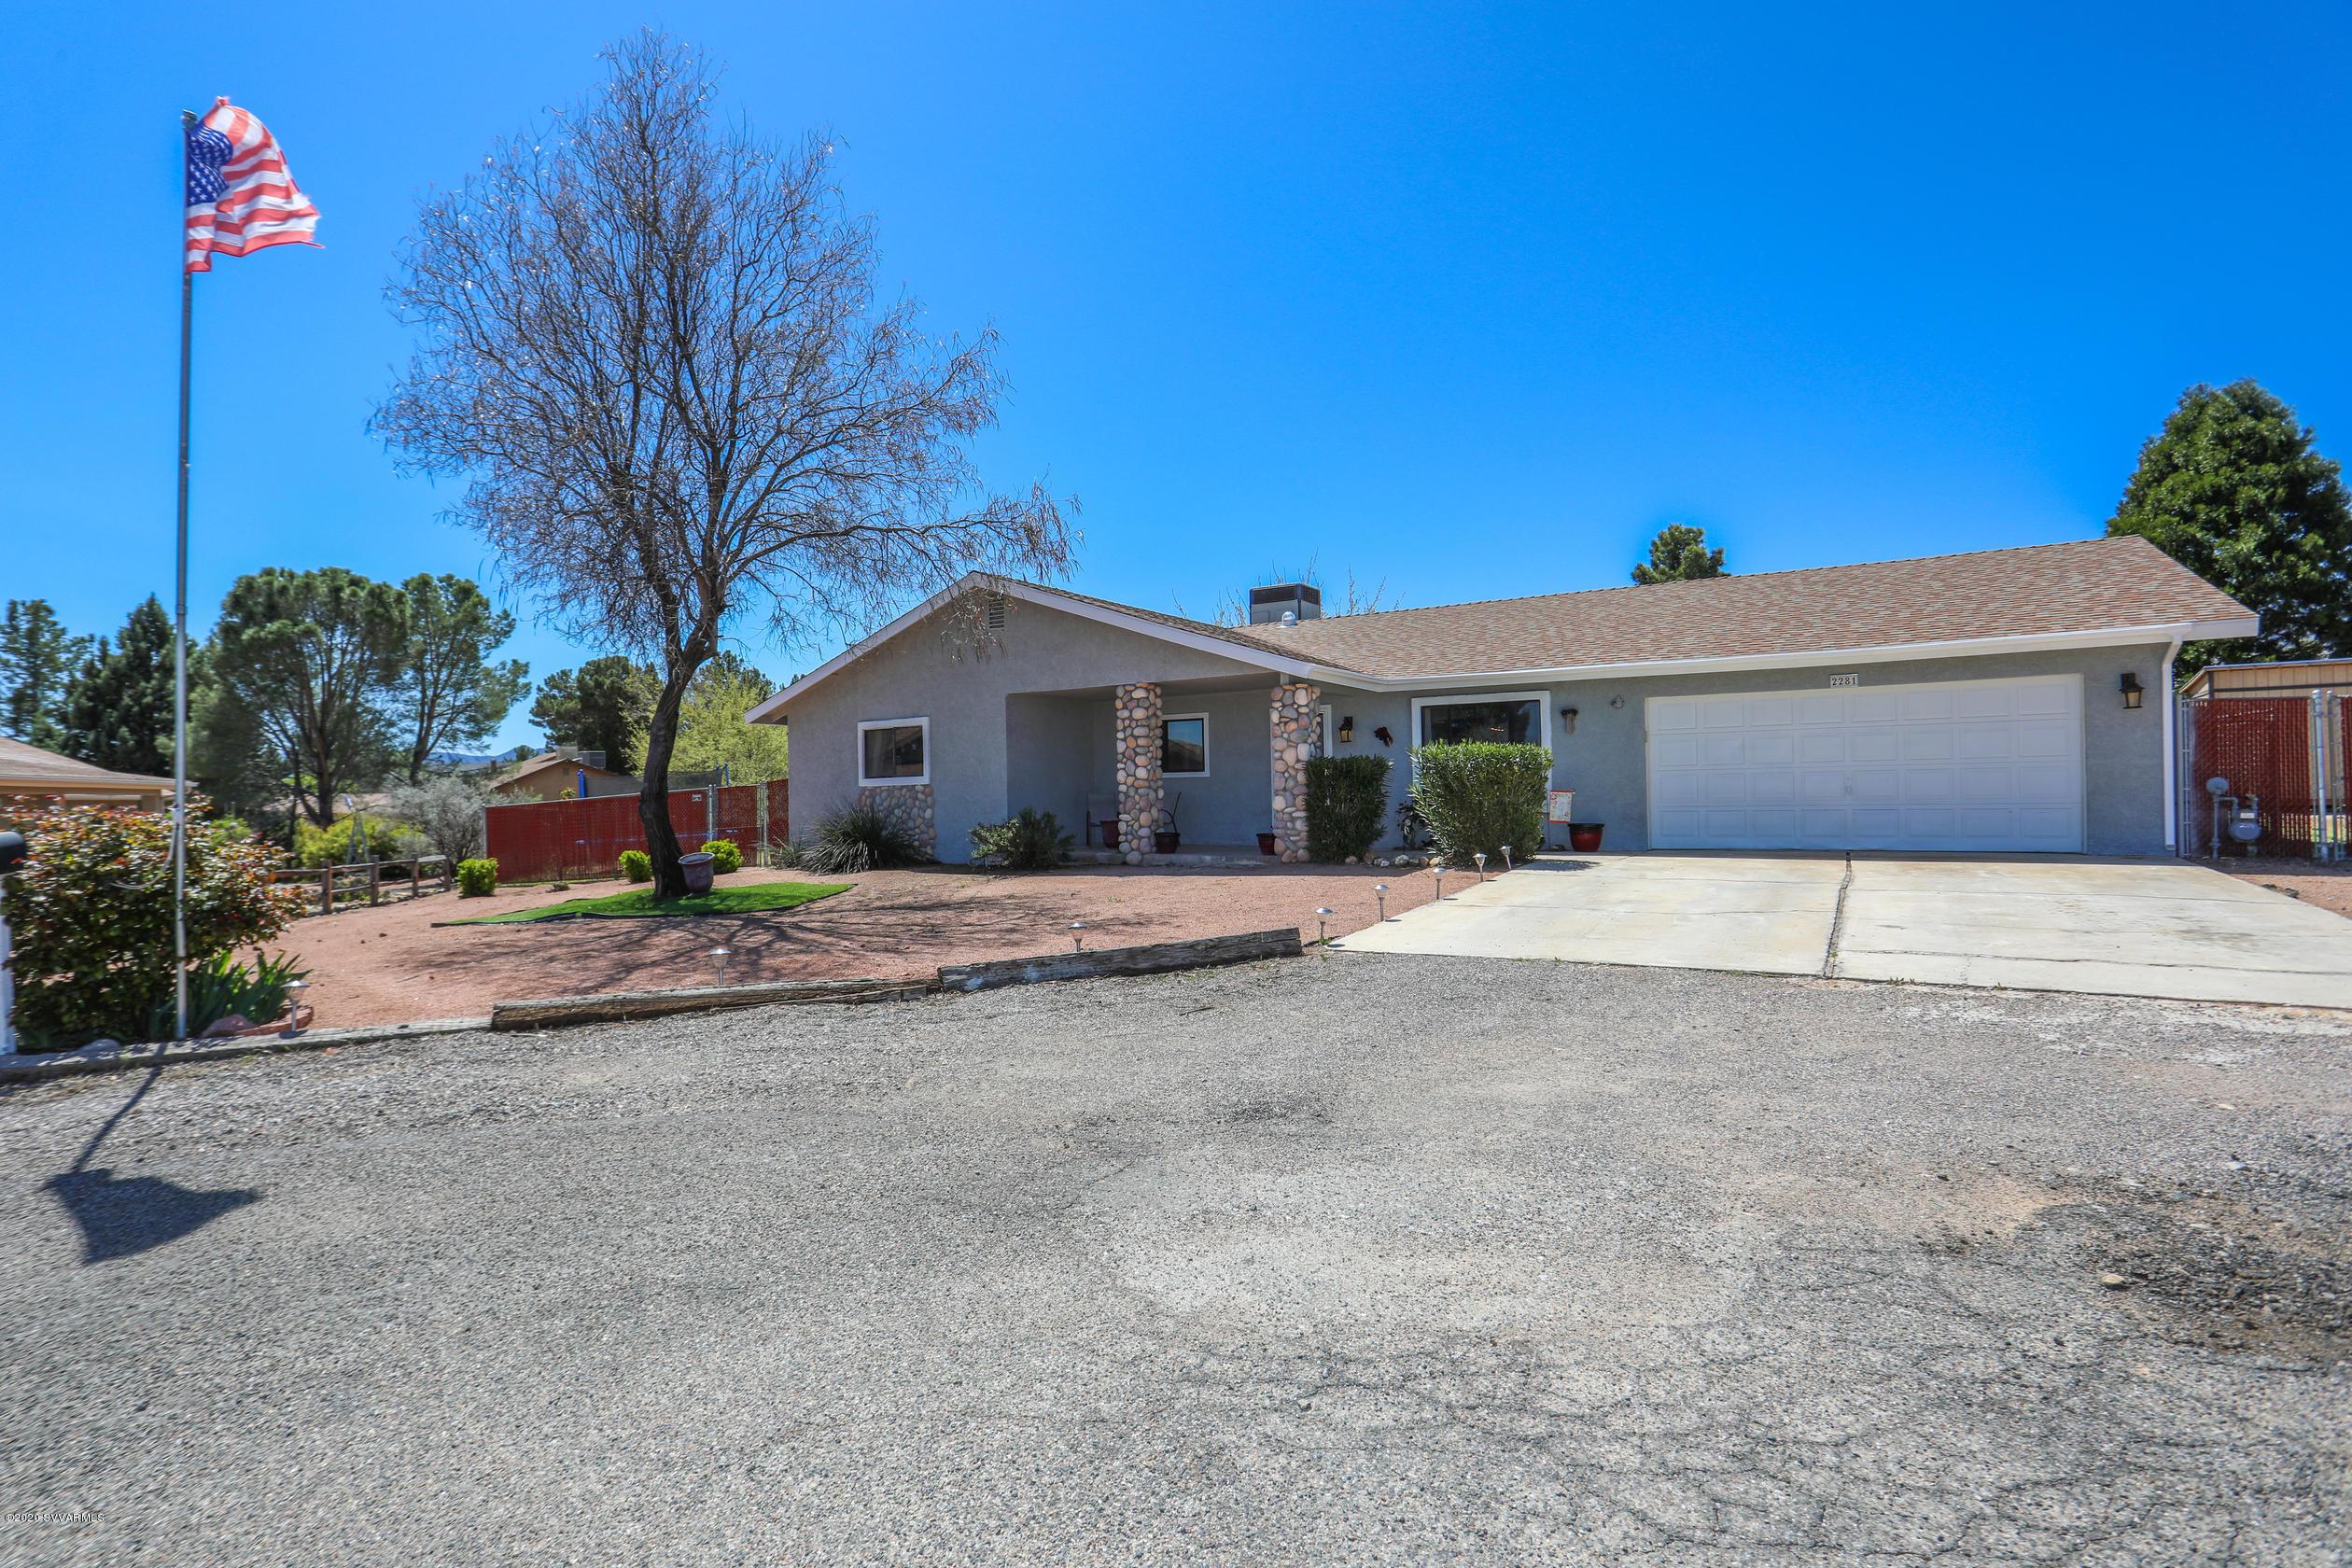 2281 Broken Rock Circle Cottonwood, AZ 86326